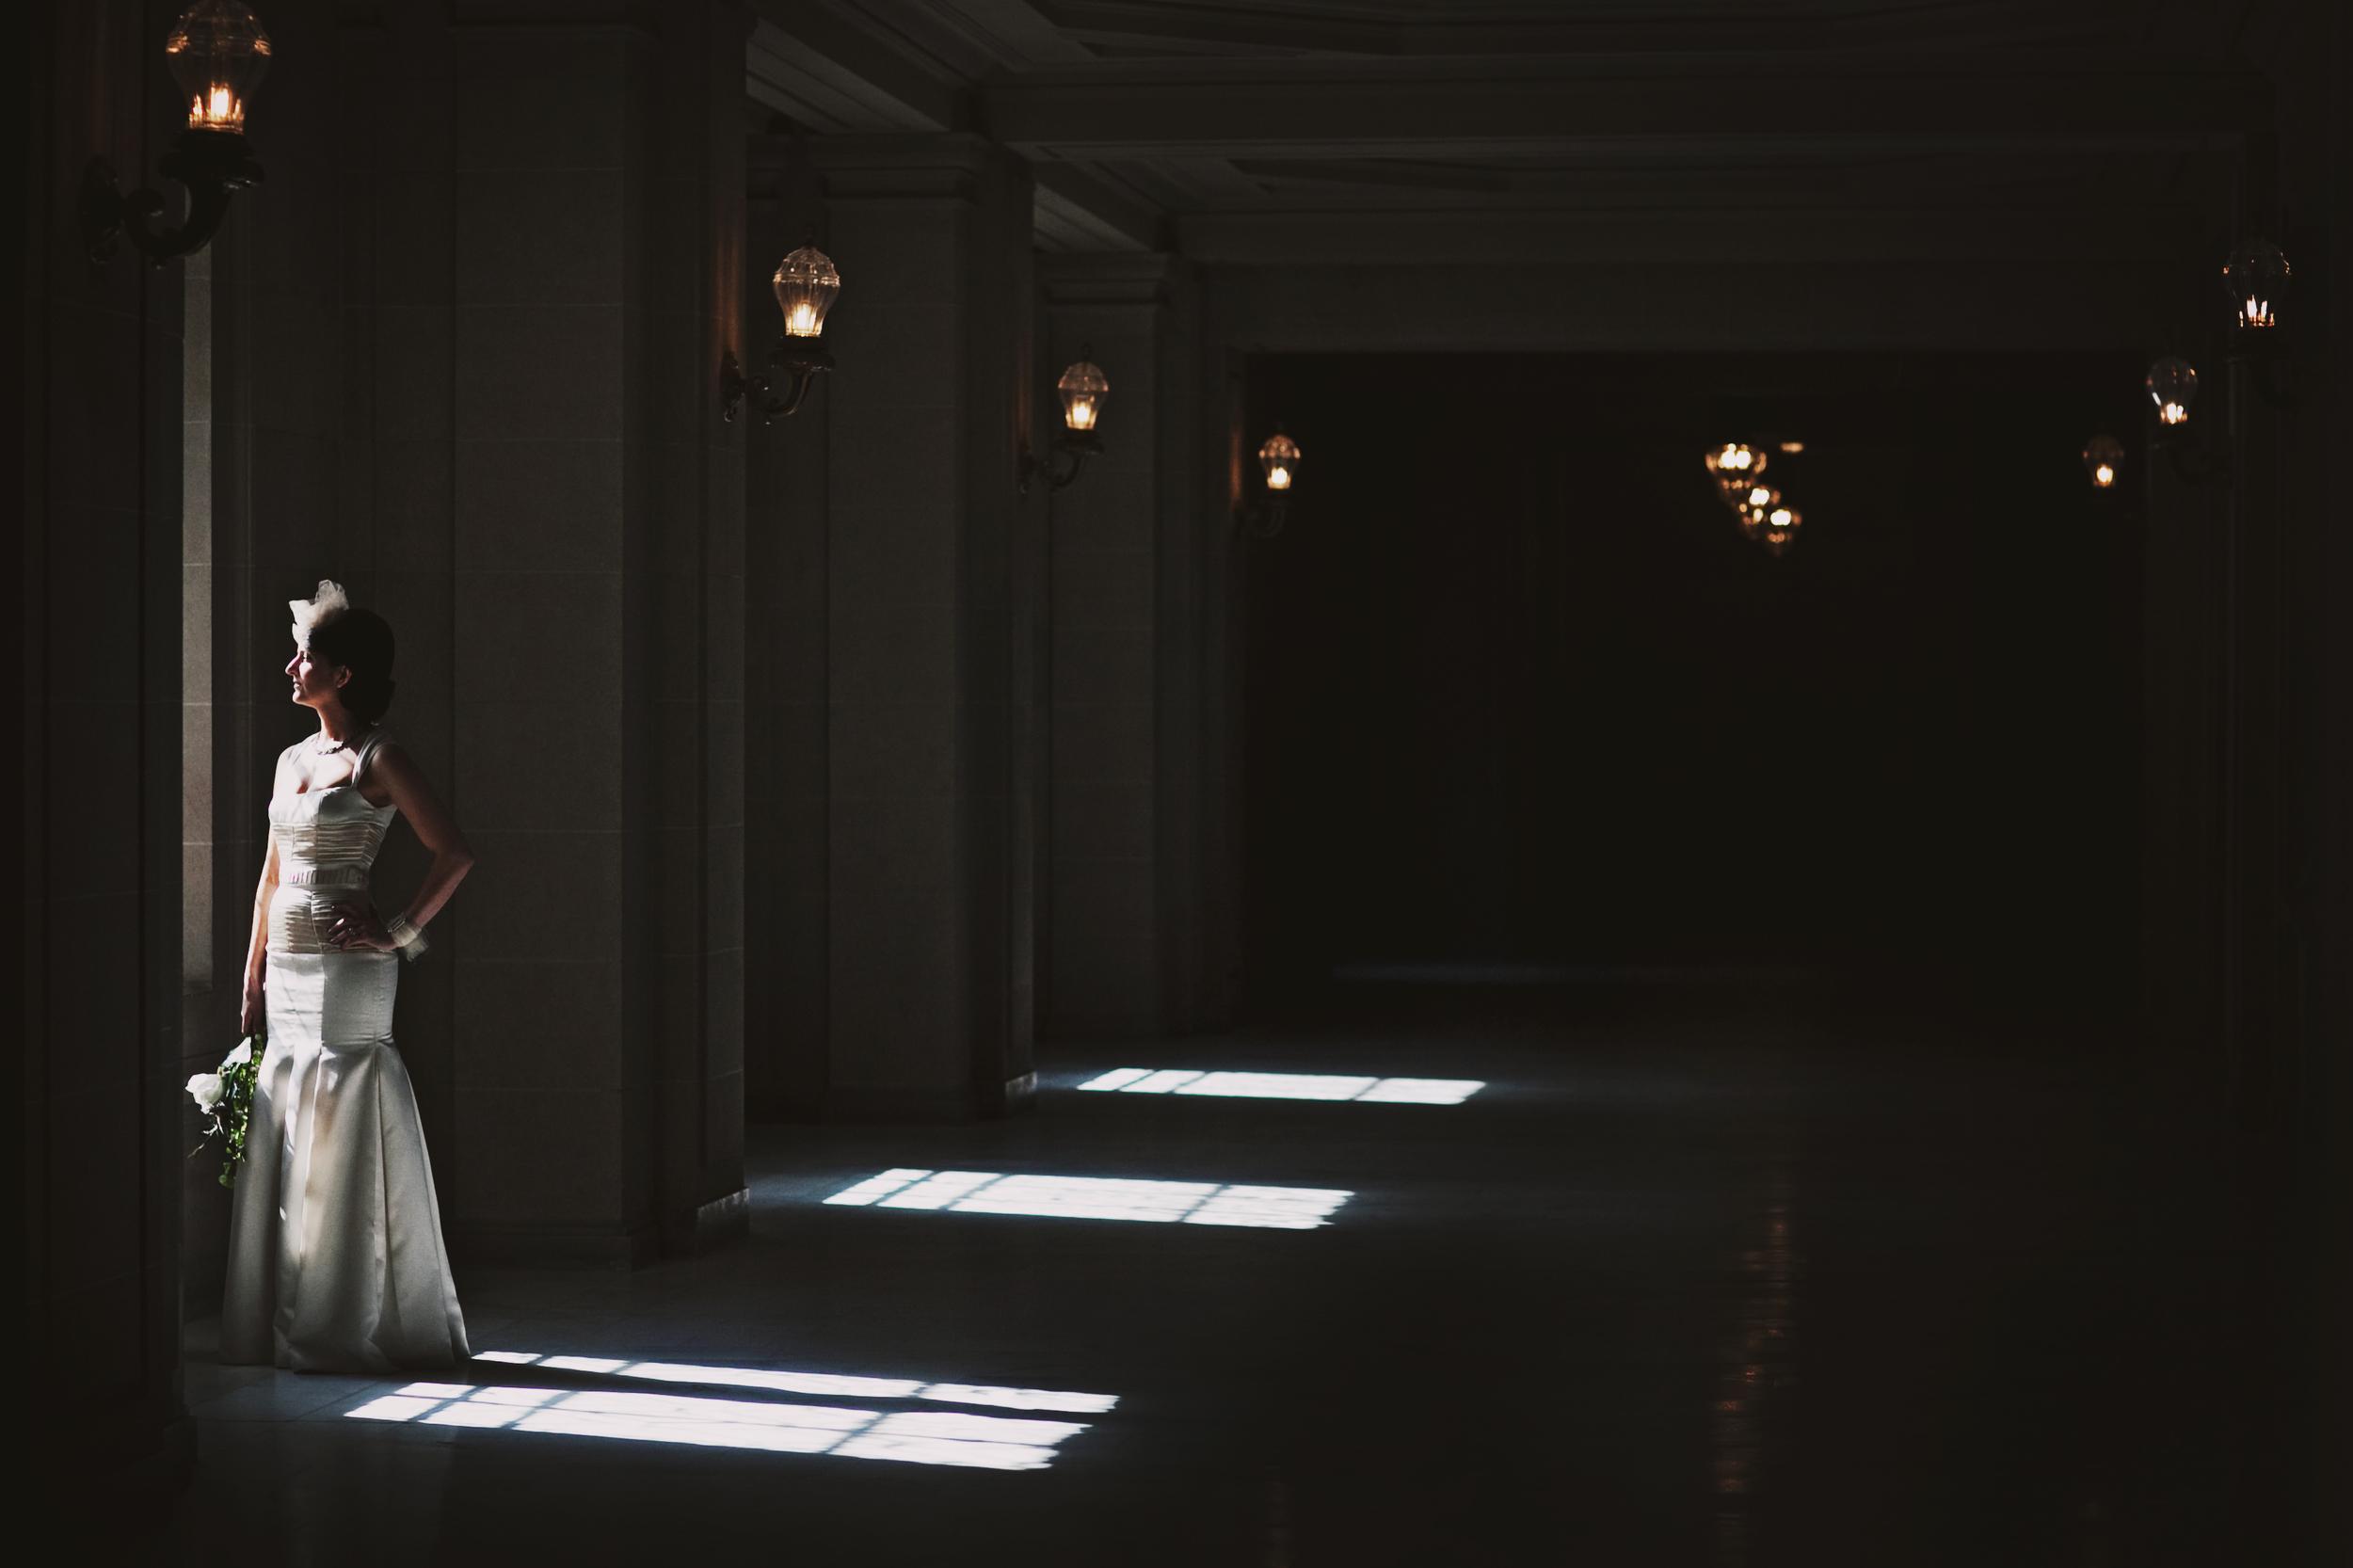 San_Francisco_City_Hall_Wedding_Photography_Cori_EB-11.JPG